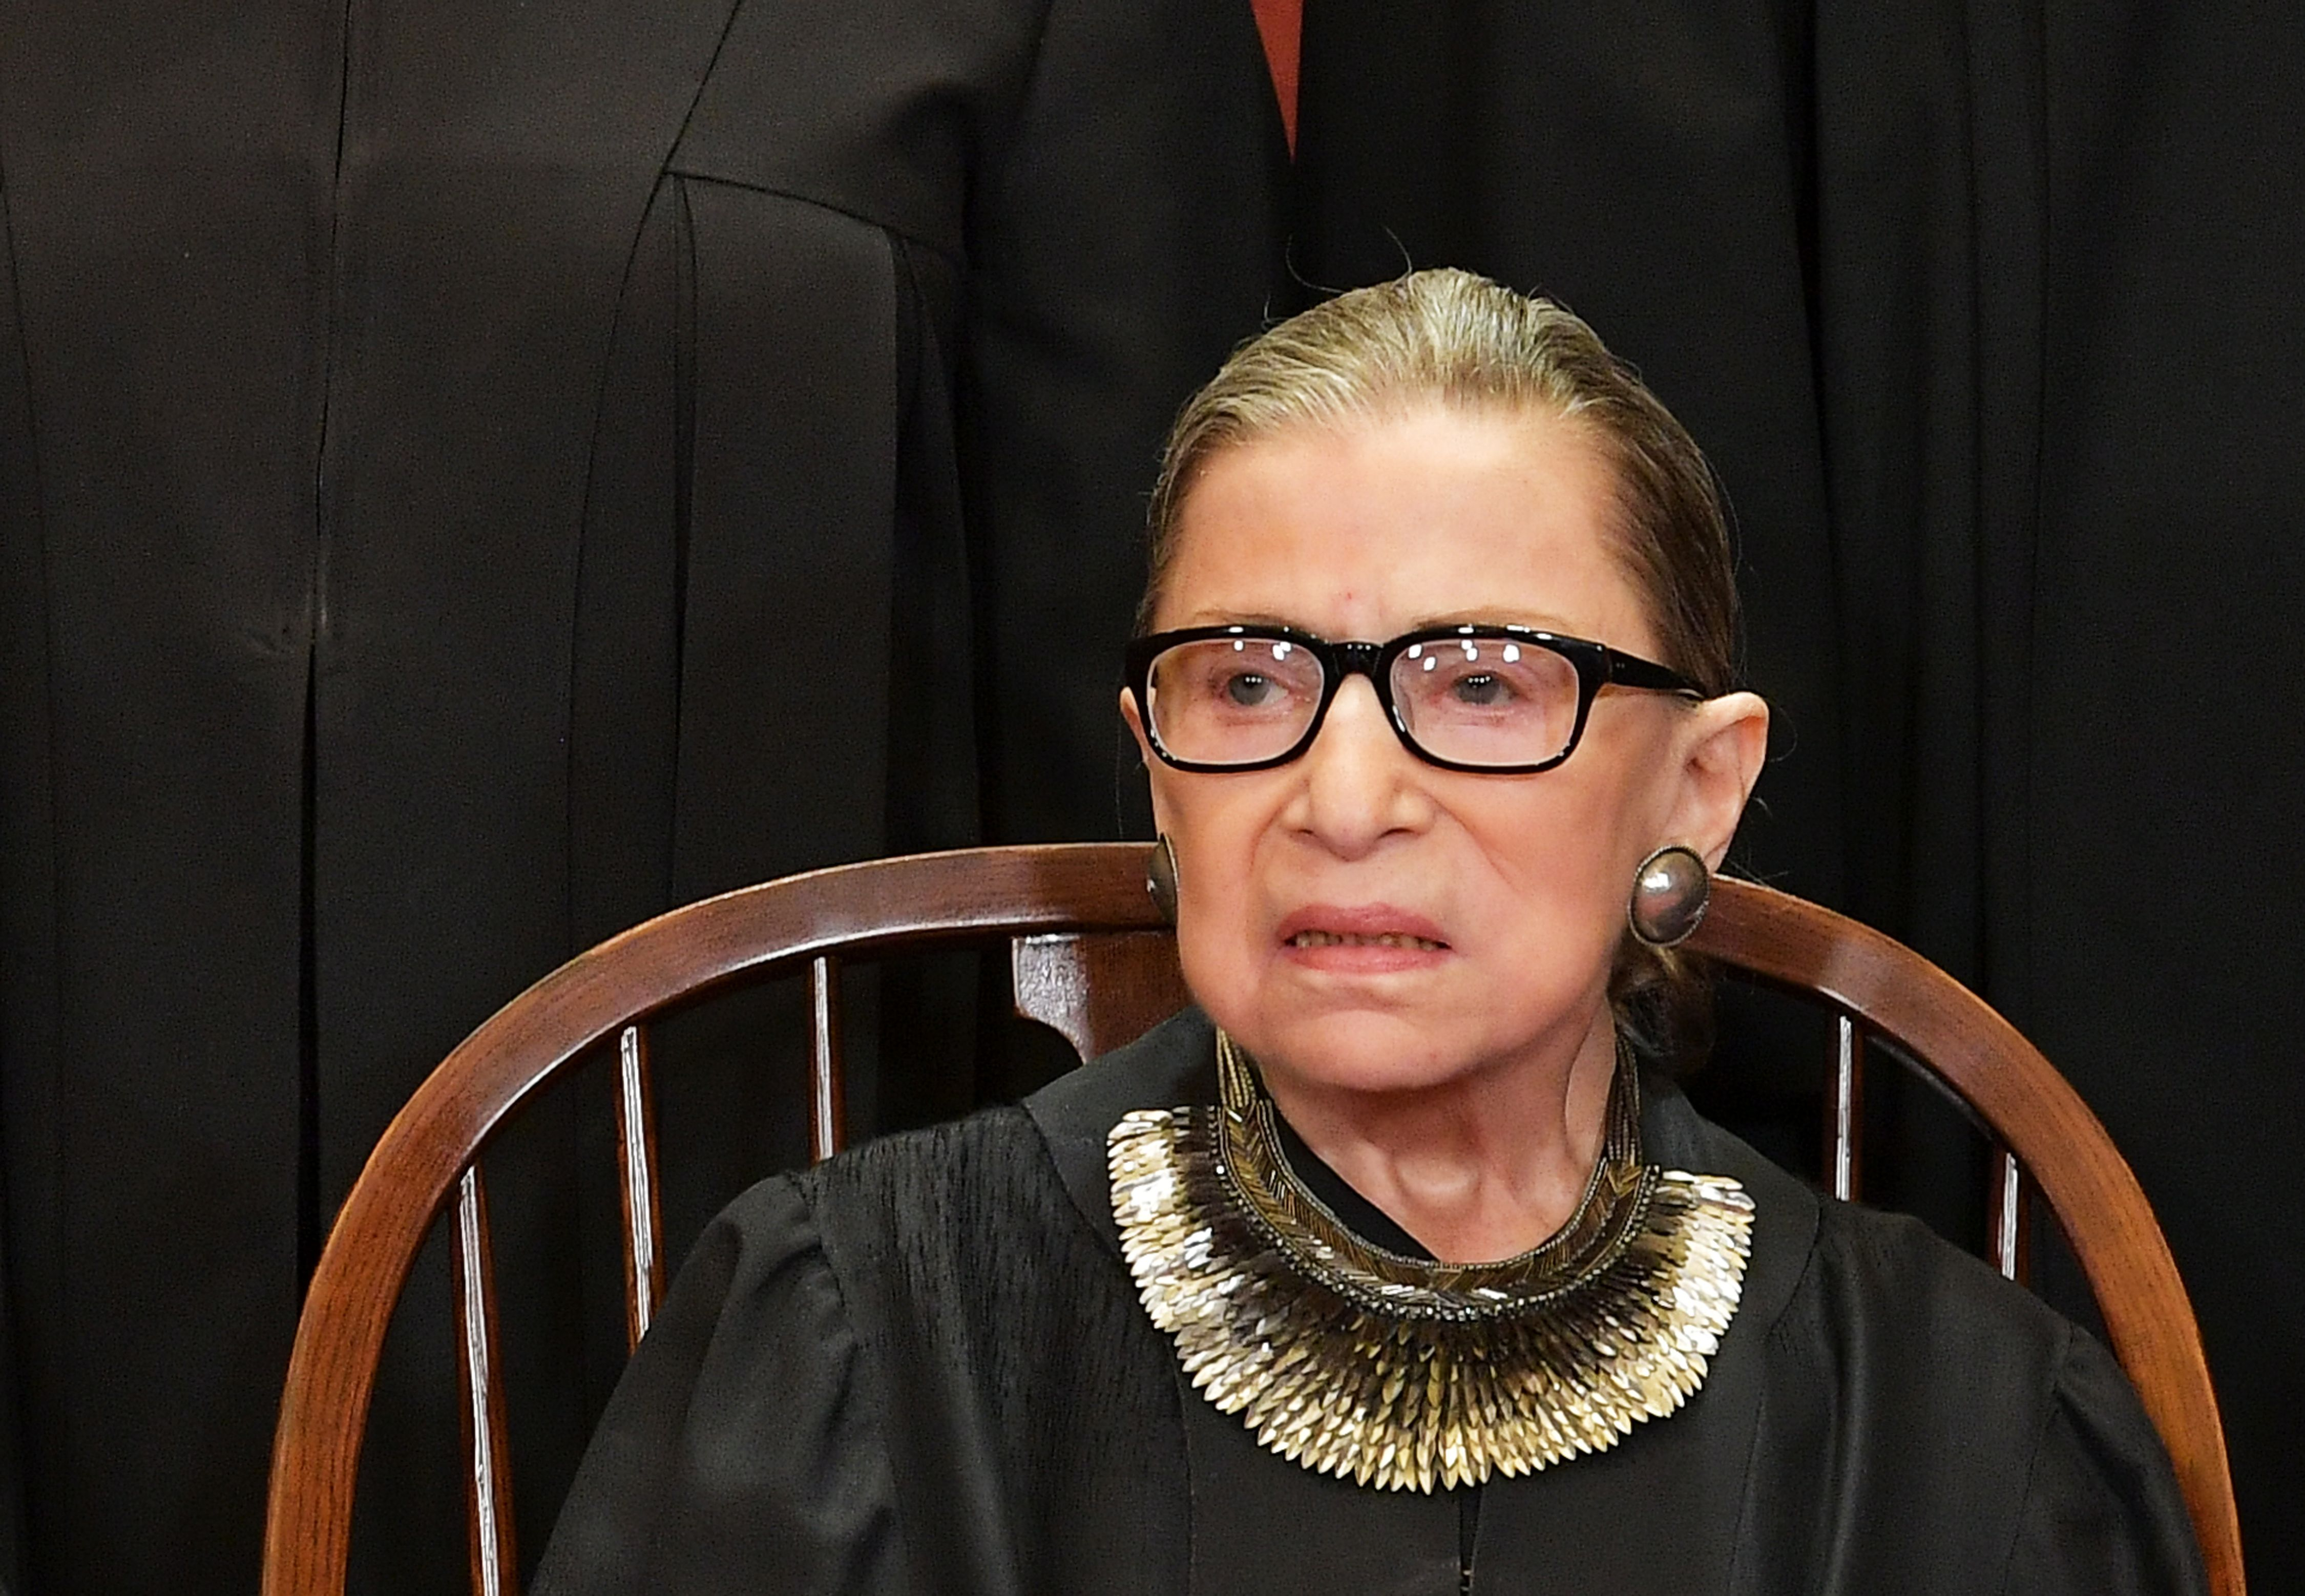 Ruth Bader Ginsburg Undergoes More Cancer Treatments